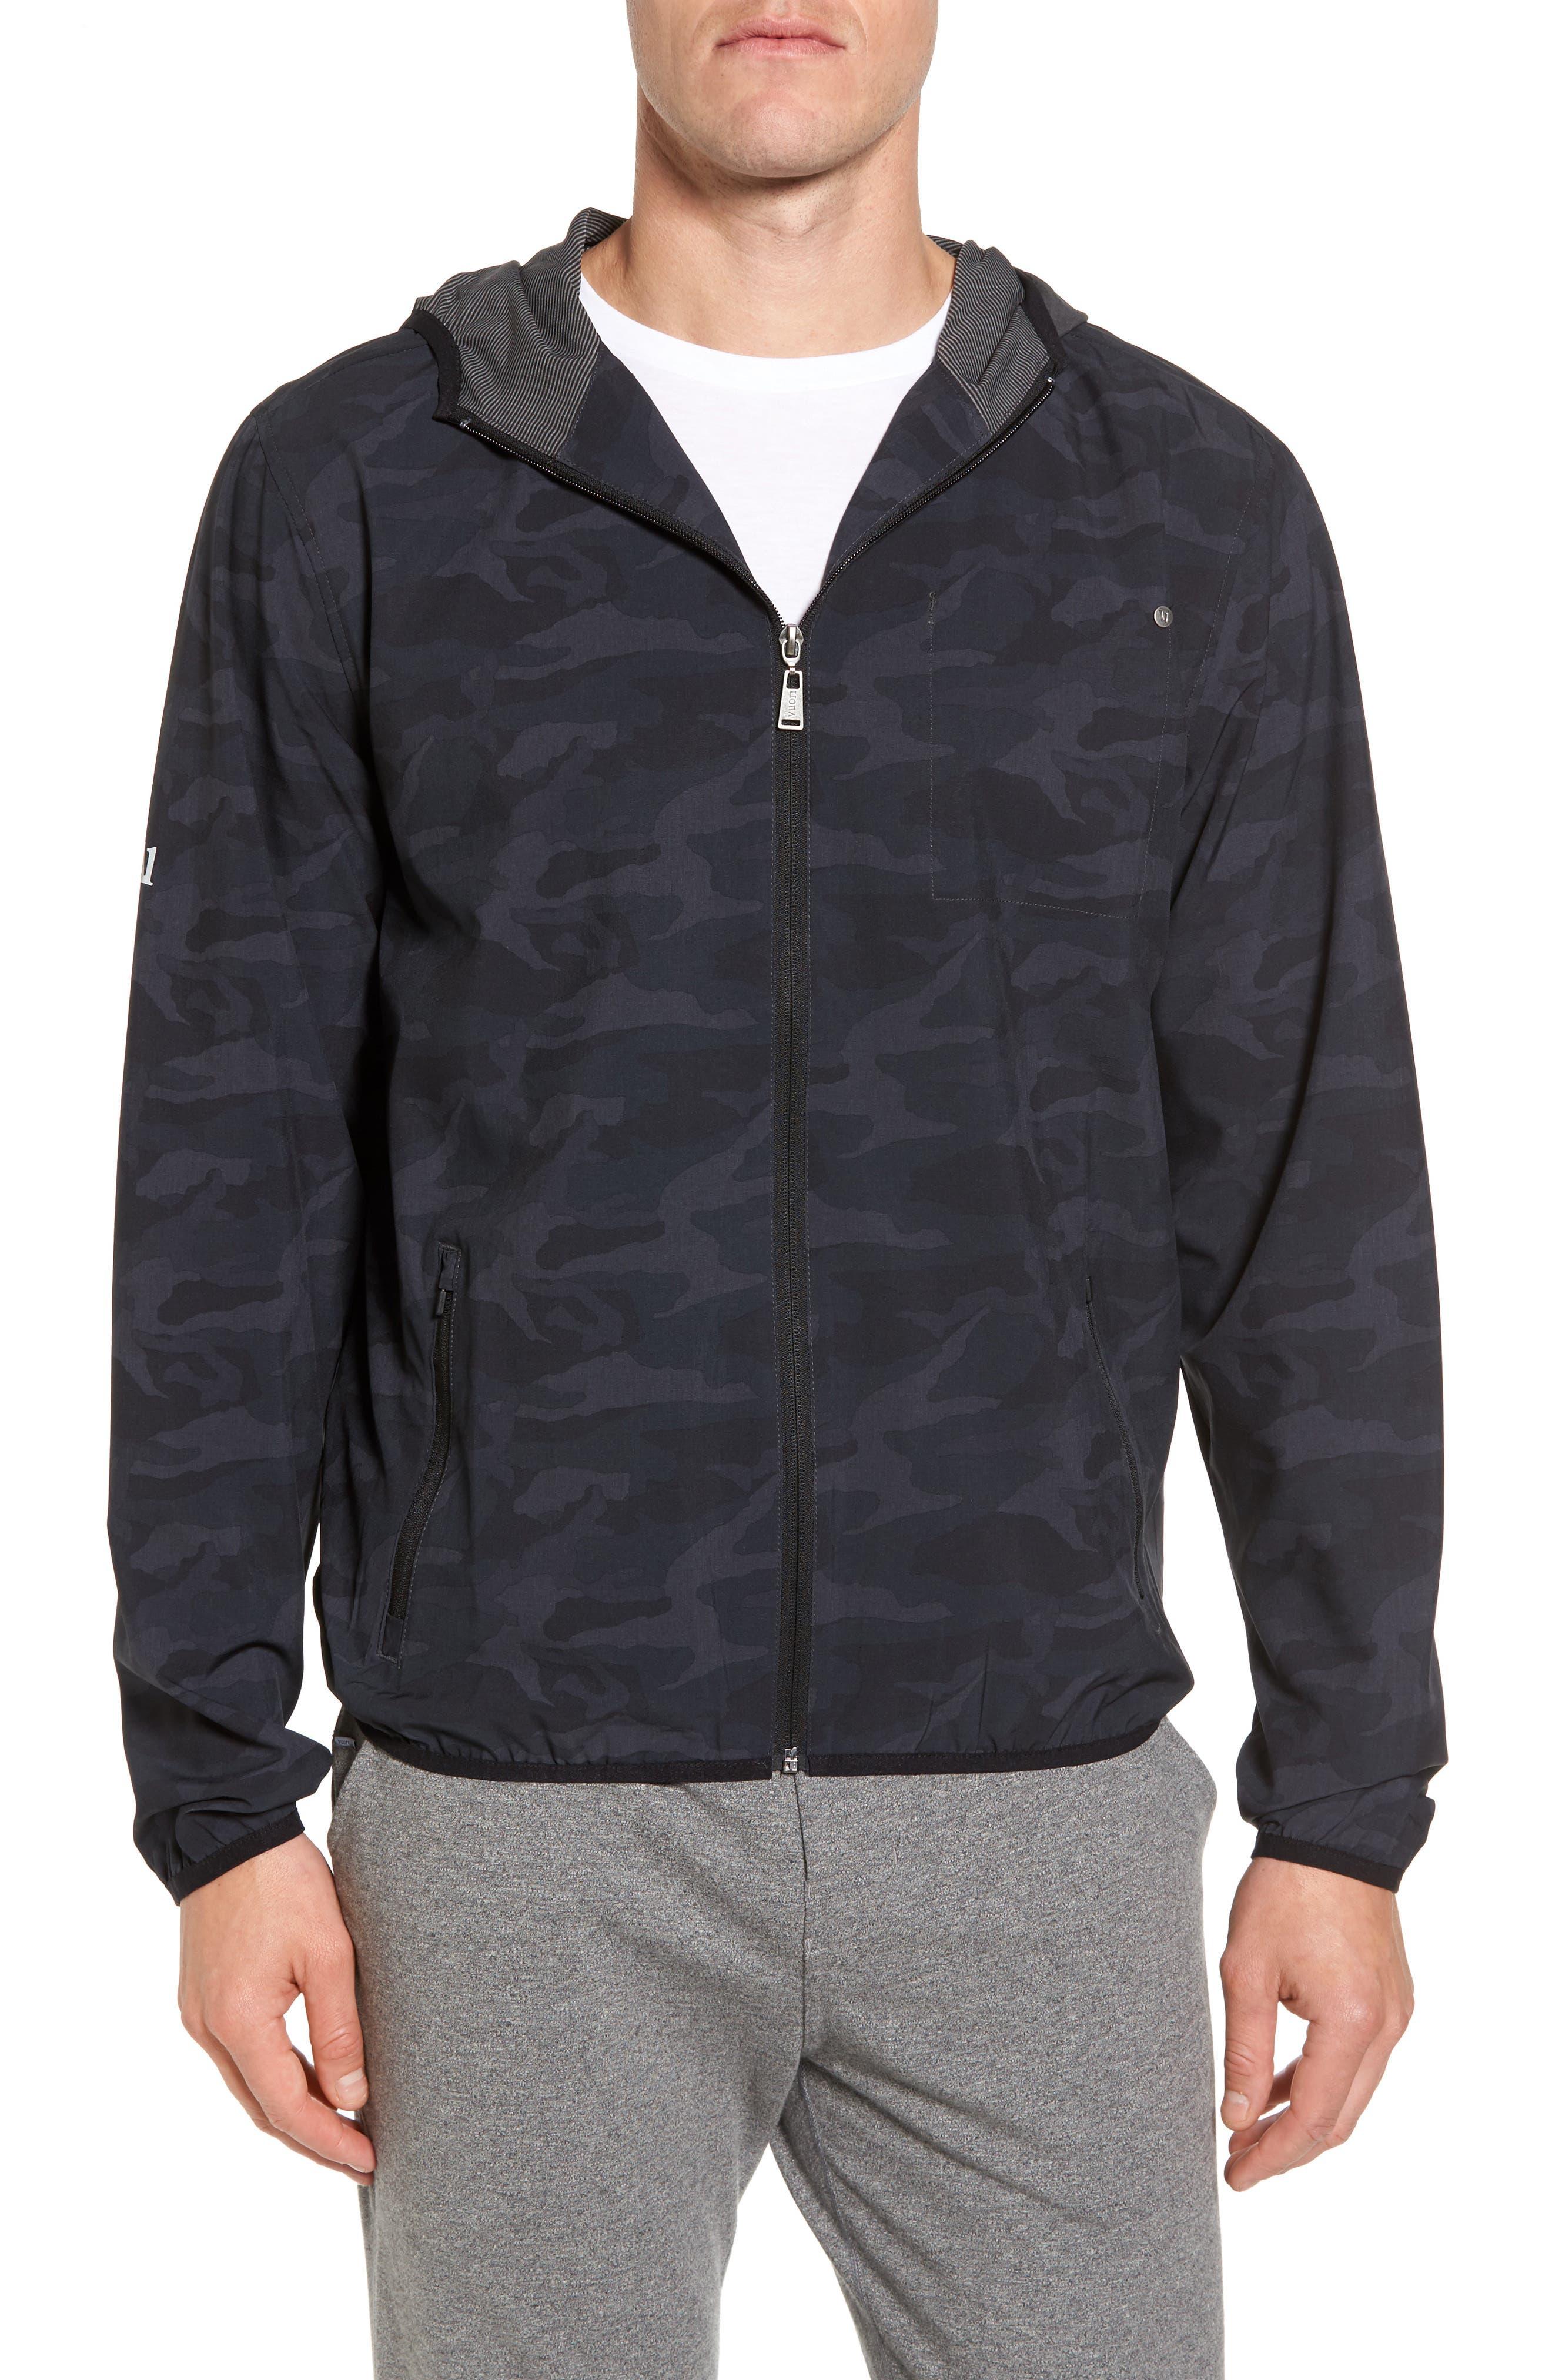 Outdoor Training Shell Jacket,                             Main thumbnail 1, color,                             Black Camo